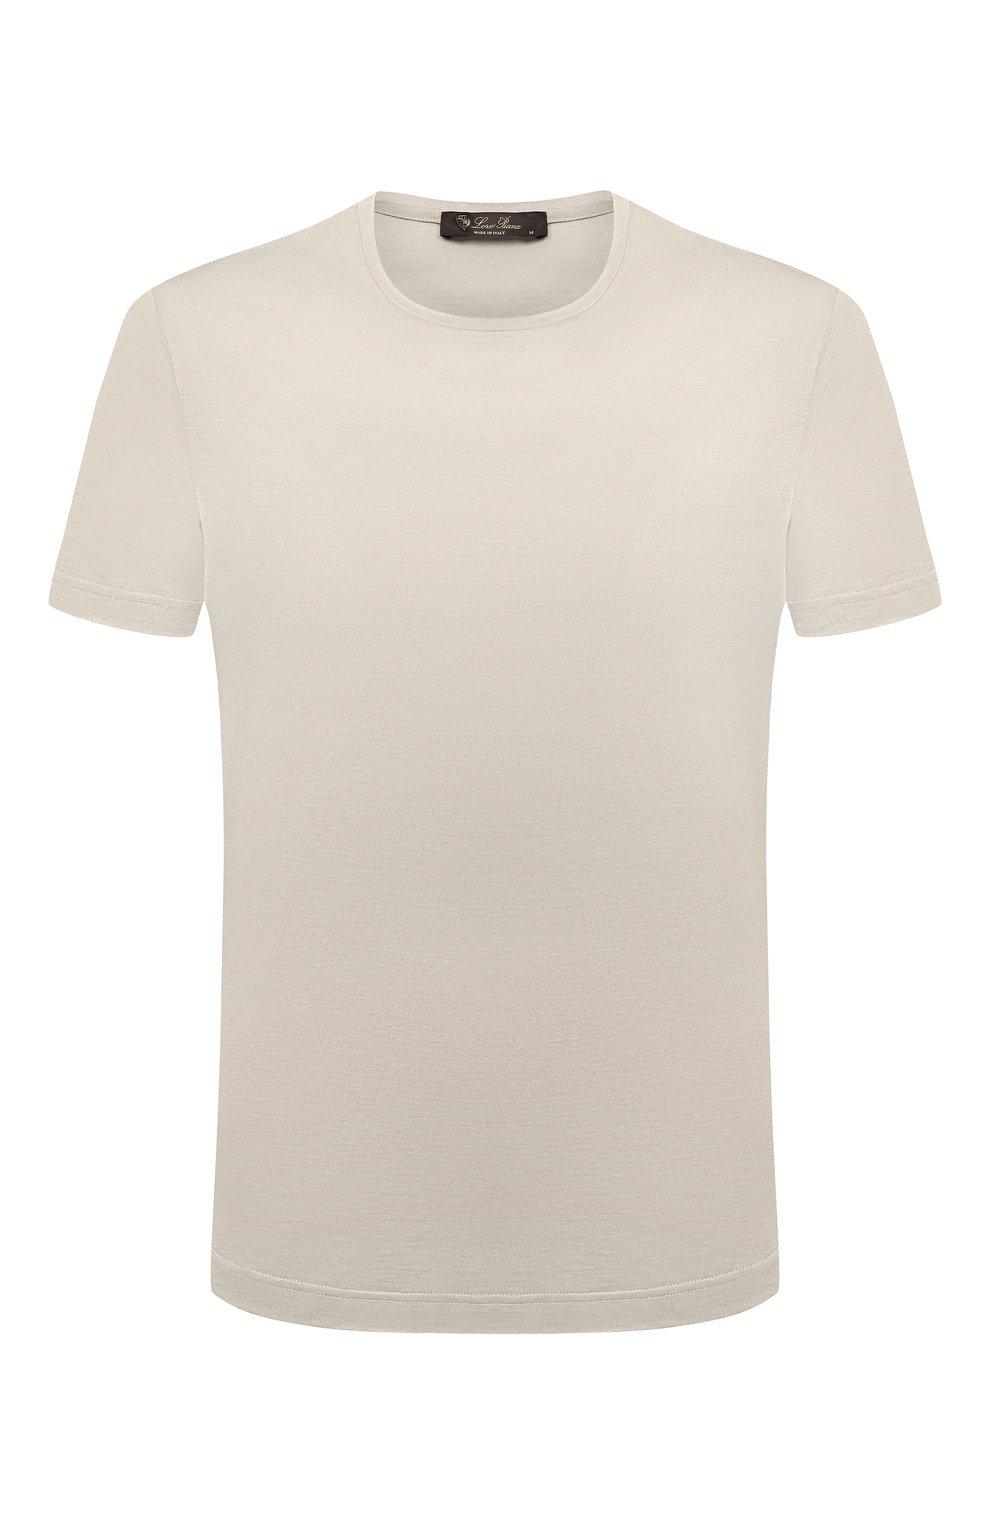 Мужская футболка из шелка и хлопка LORO PIANA светло-серого цвета, арт. FAF6128 | Фото 1